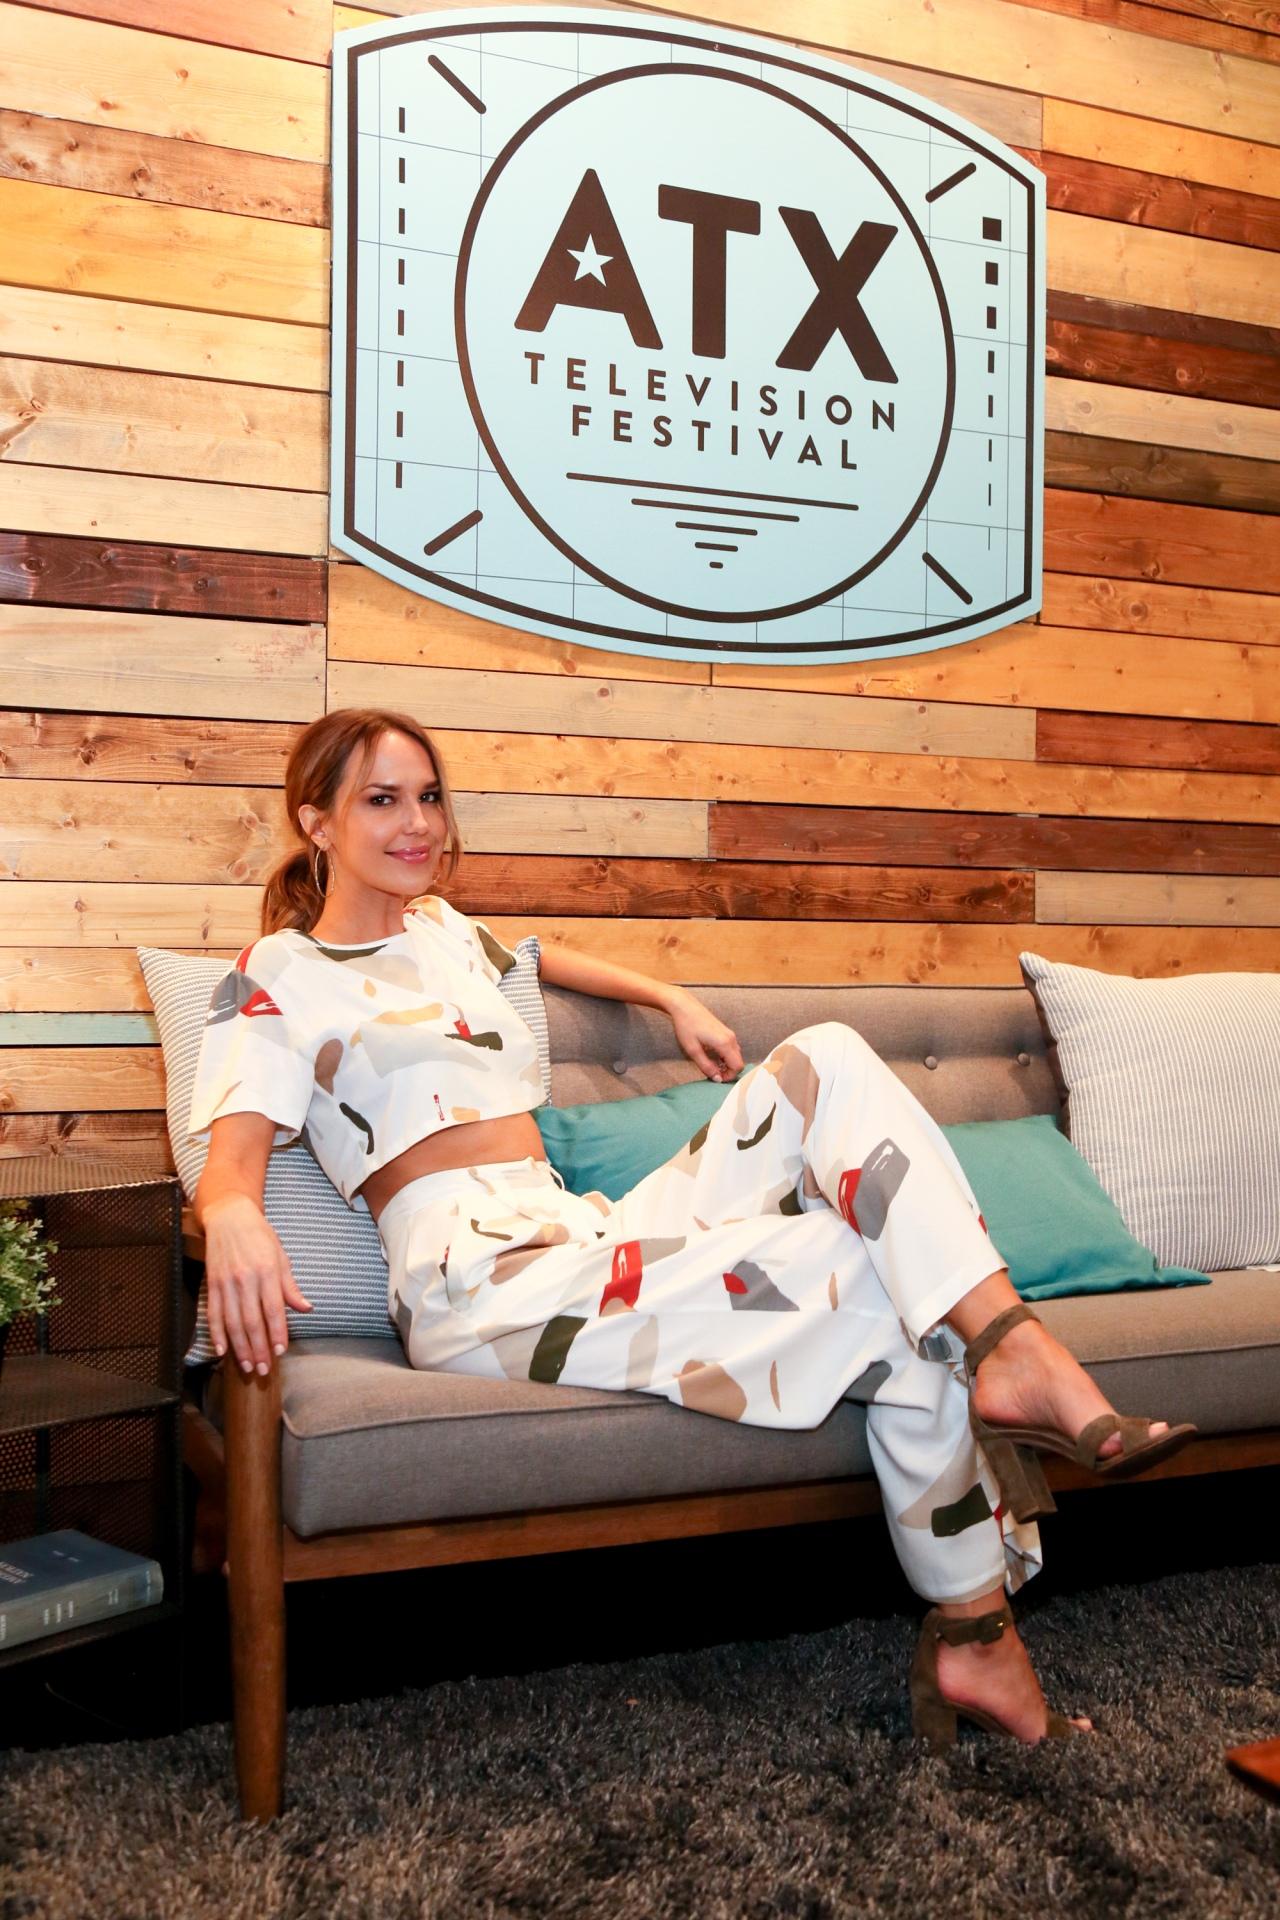 Highlights From ATX TV Festival inAustin